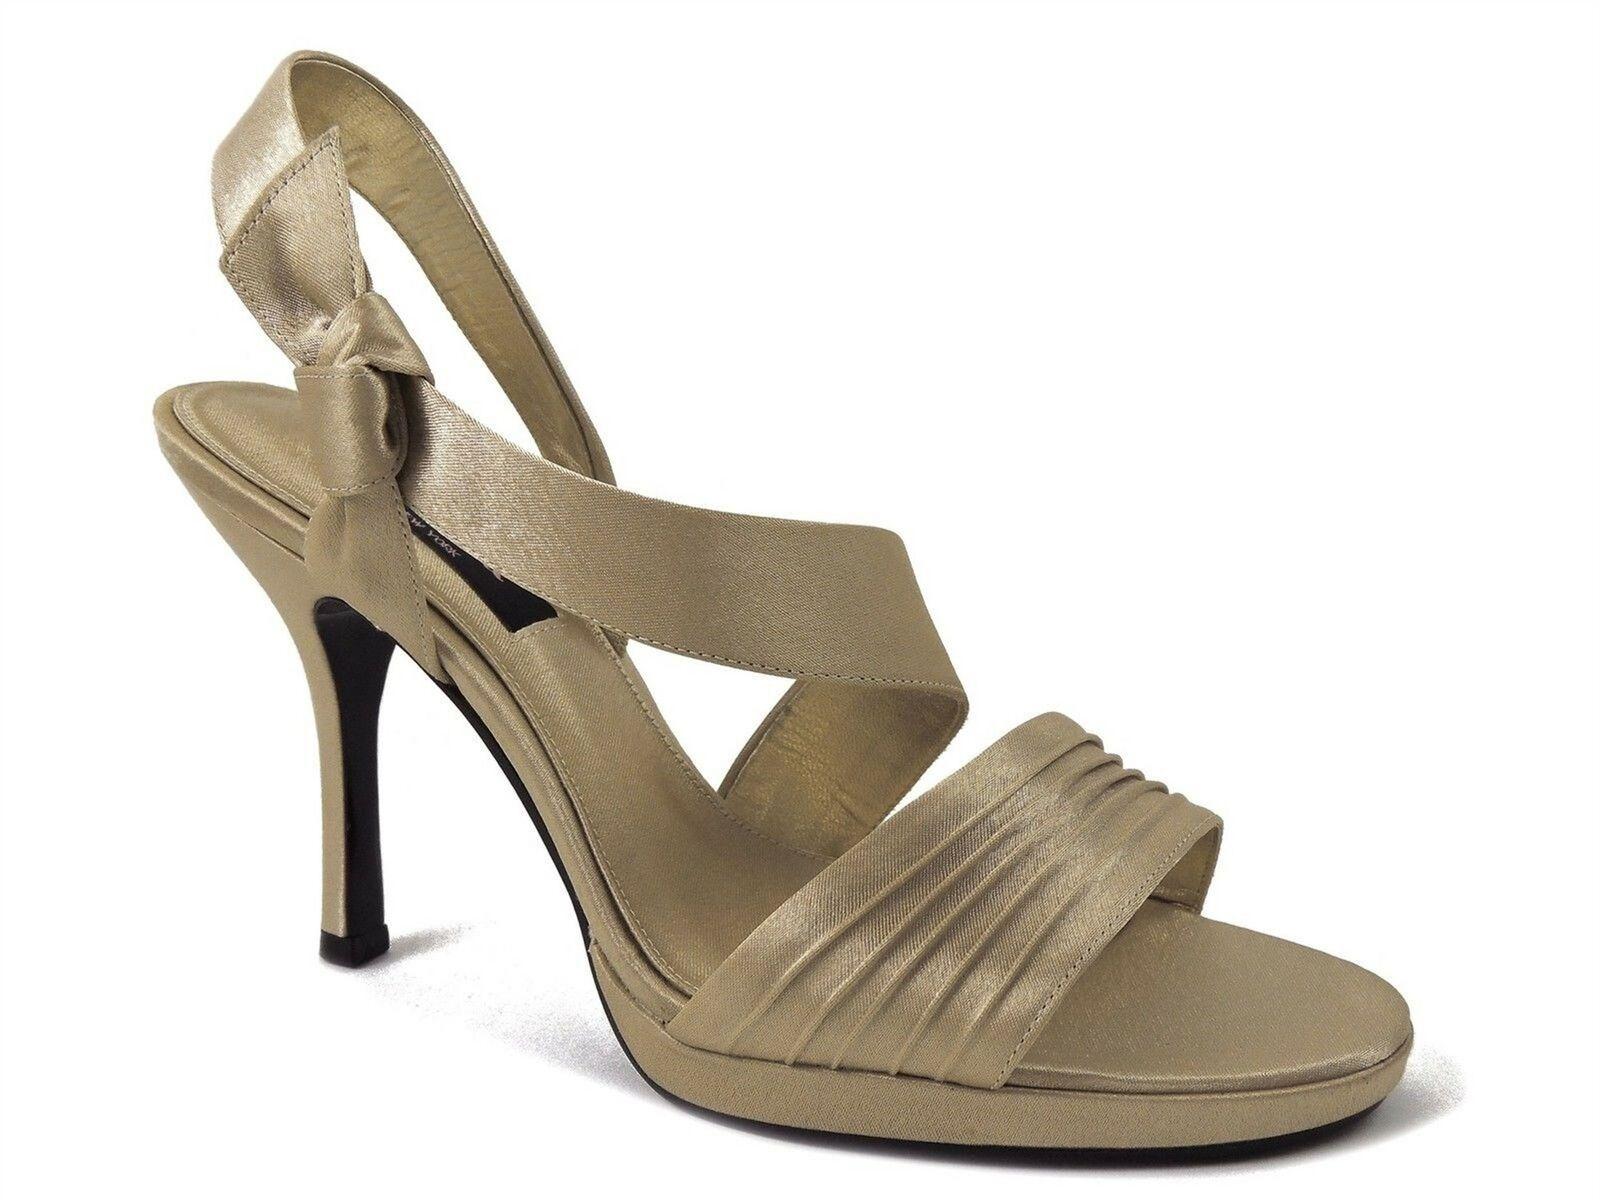 010deaa178a Nina Women's Gesalyn-Ys Platform Sandals In Royal gold Satin Size 10 ...